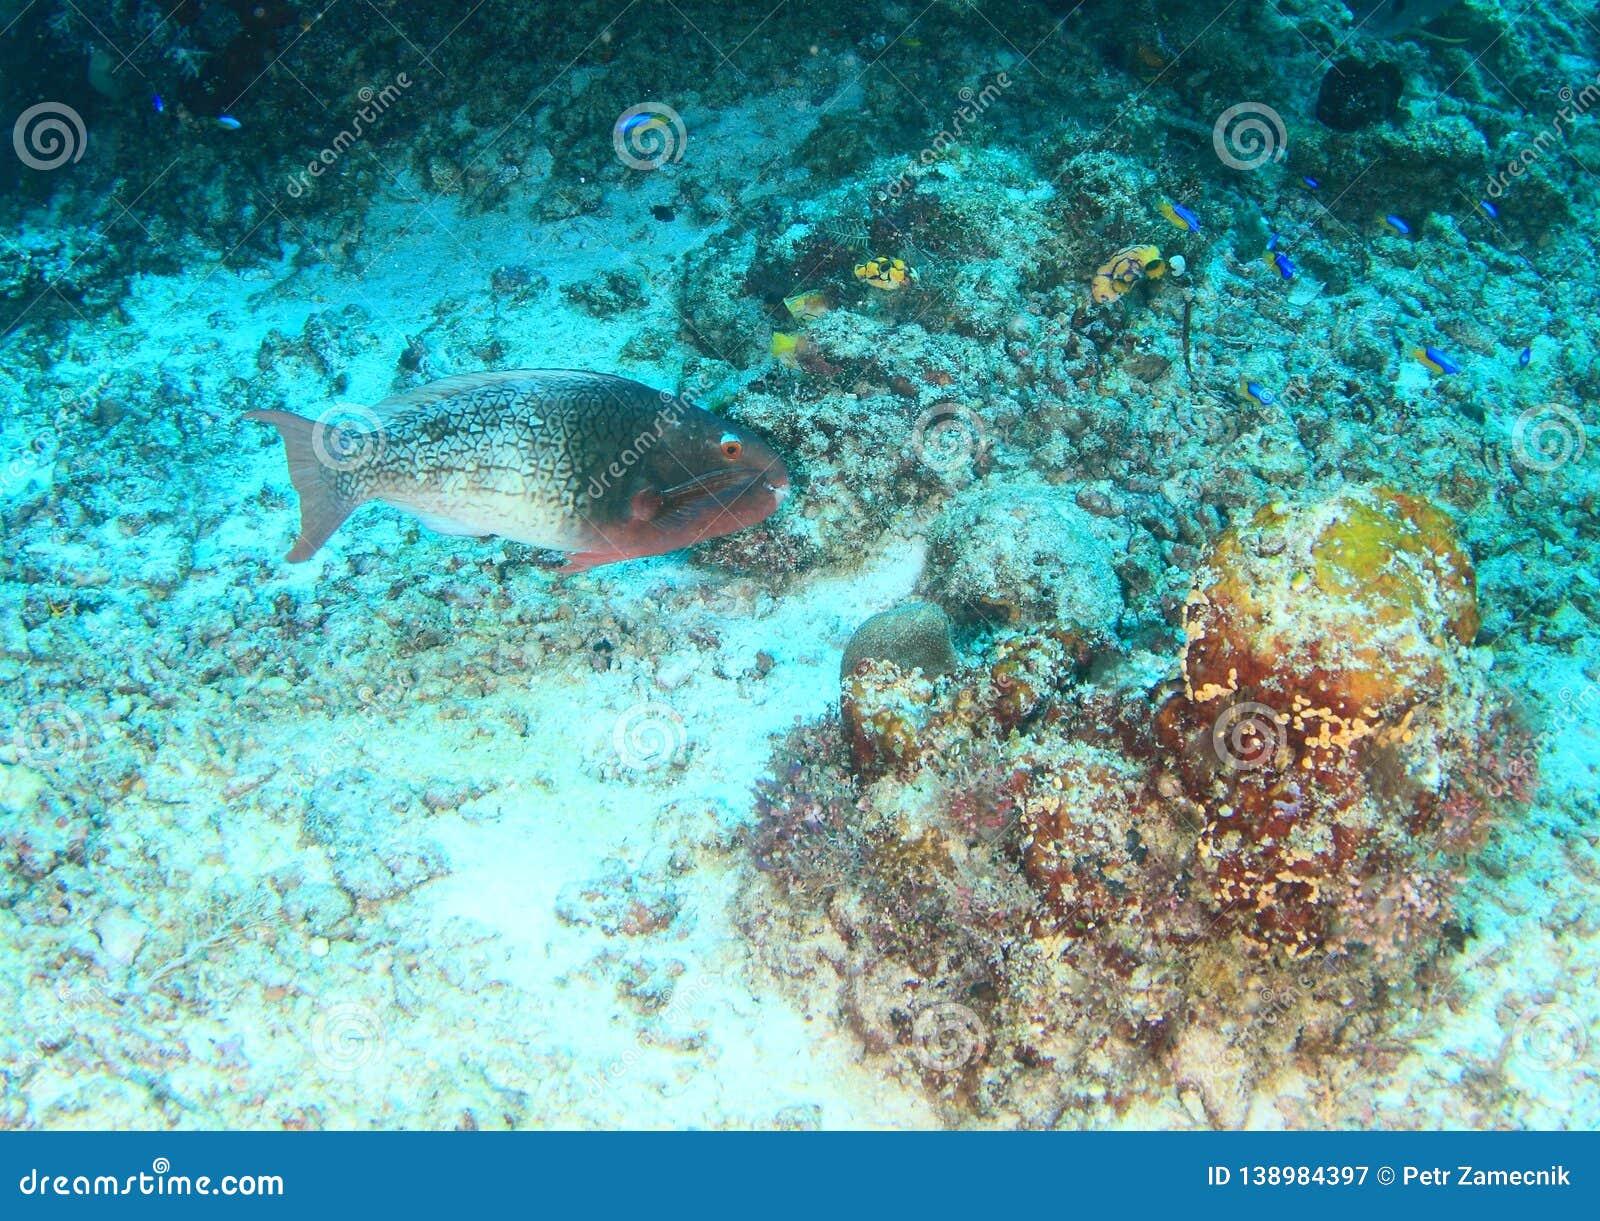 Female fish Black-veined parrotfish